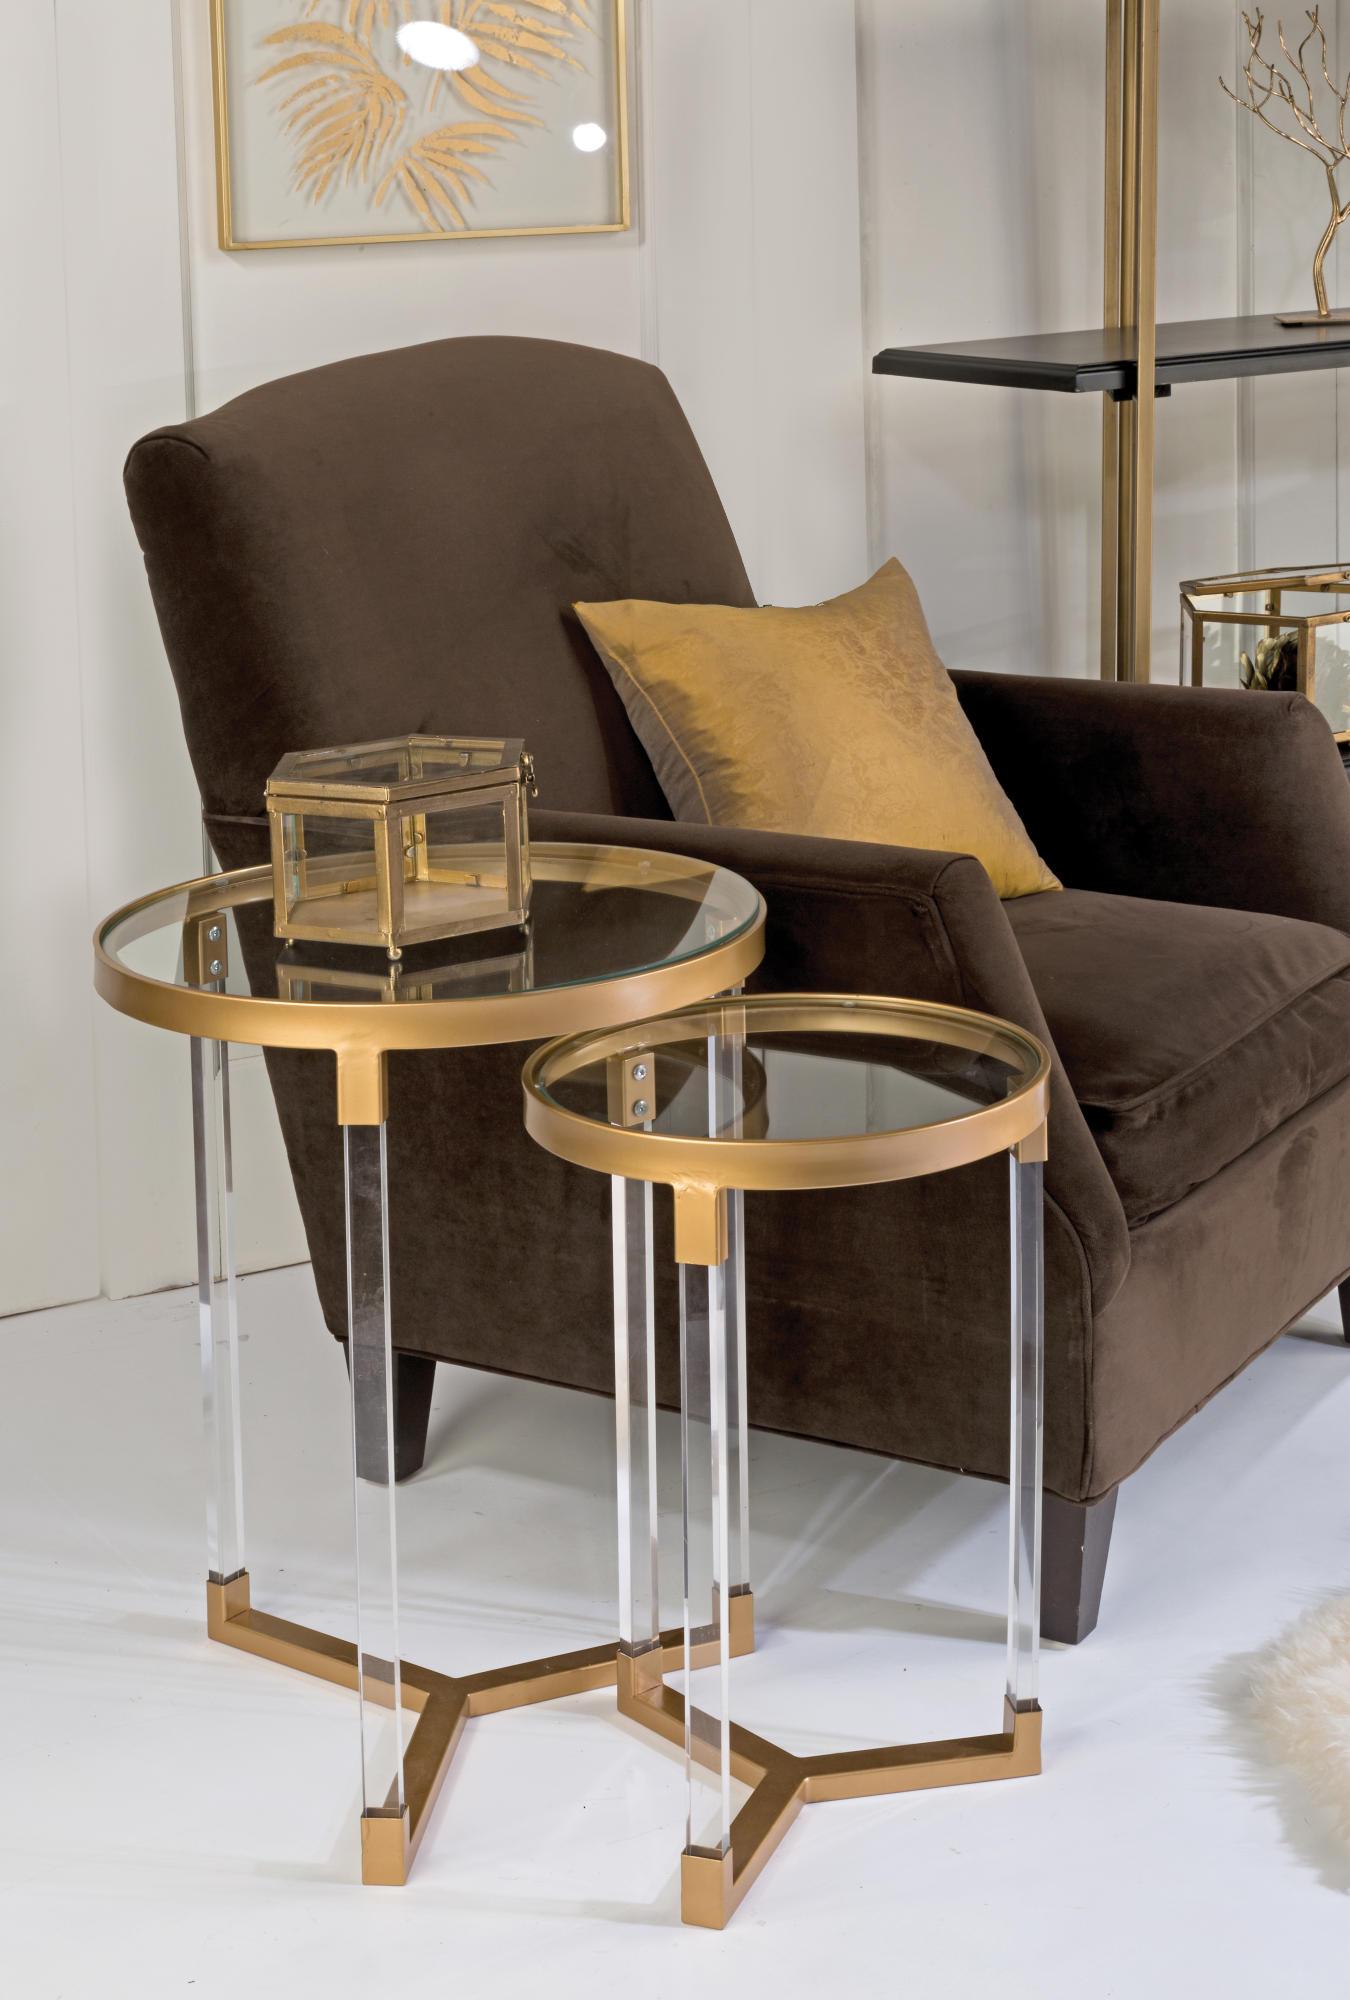 Stupendous Acrylic Side Tables With Gold Accents Set 2 Tripar Beatyapartments Chair Design Images Beatyapartmentscom